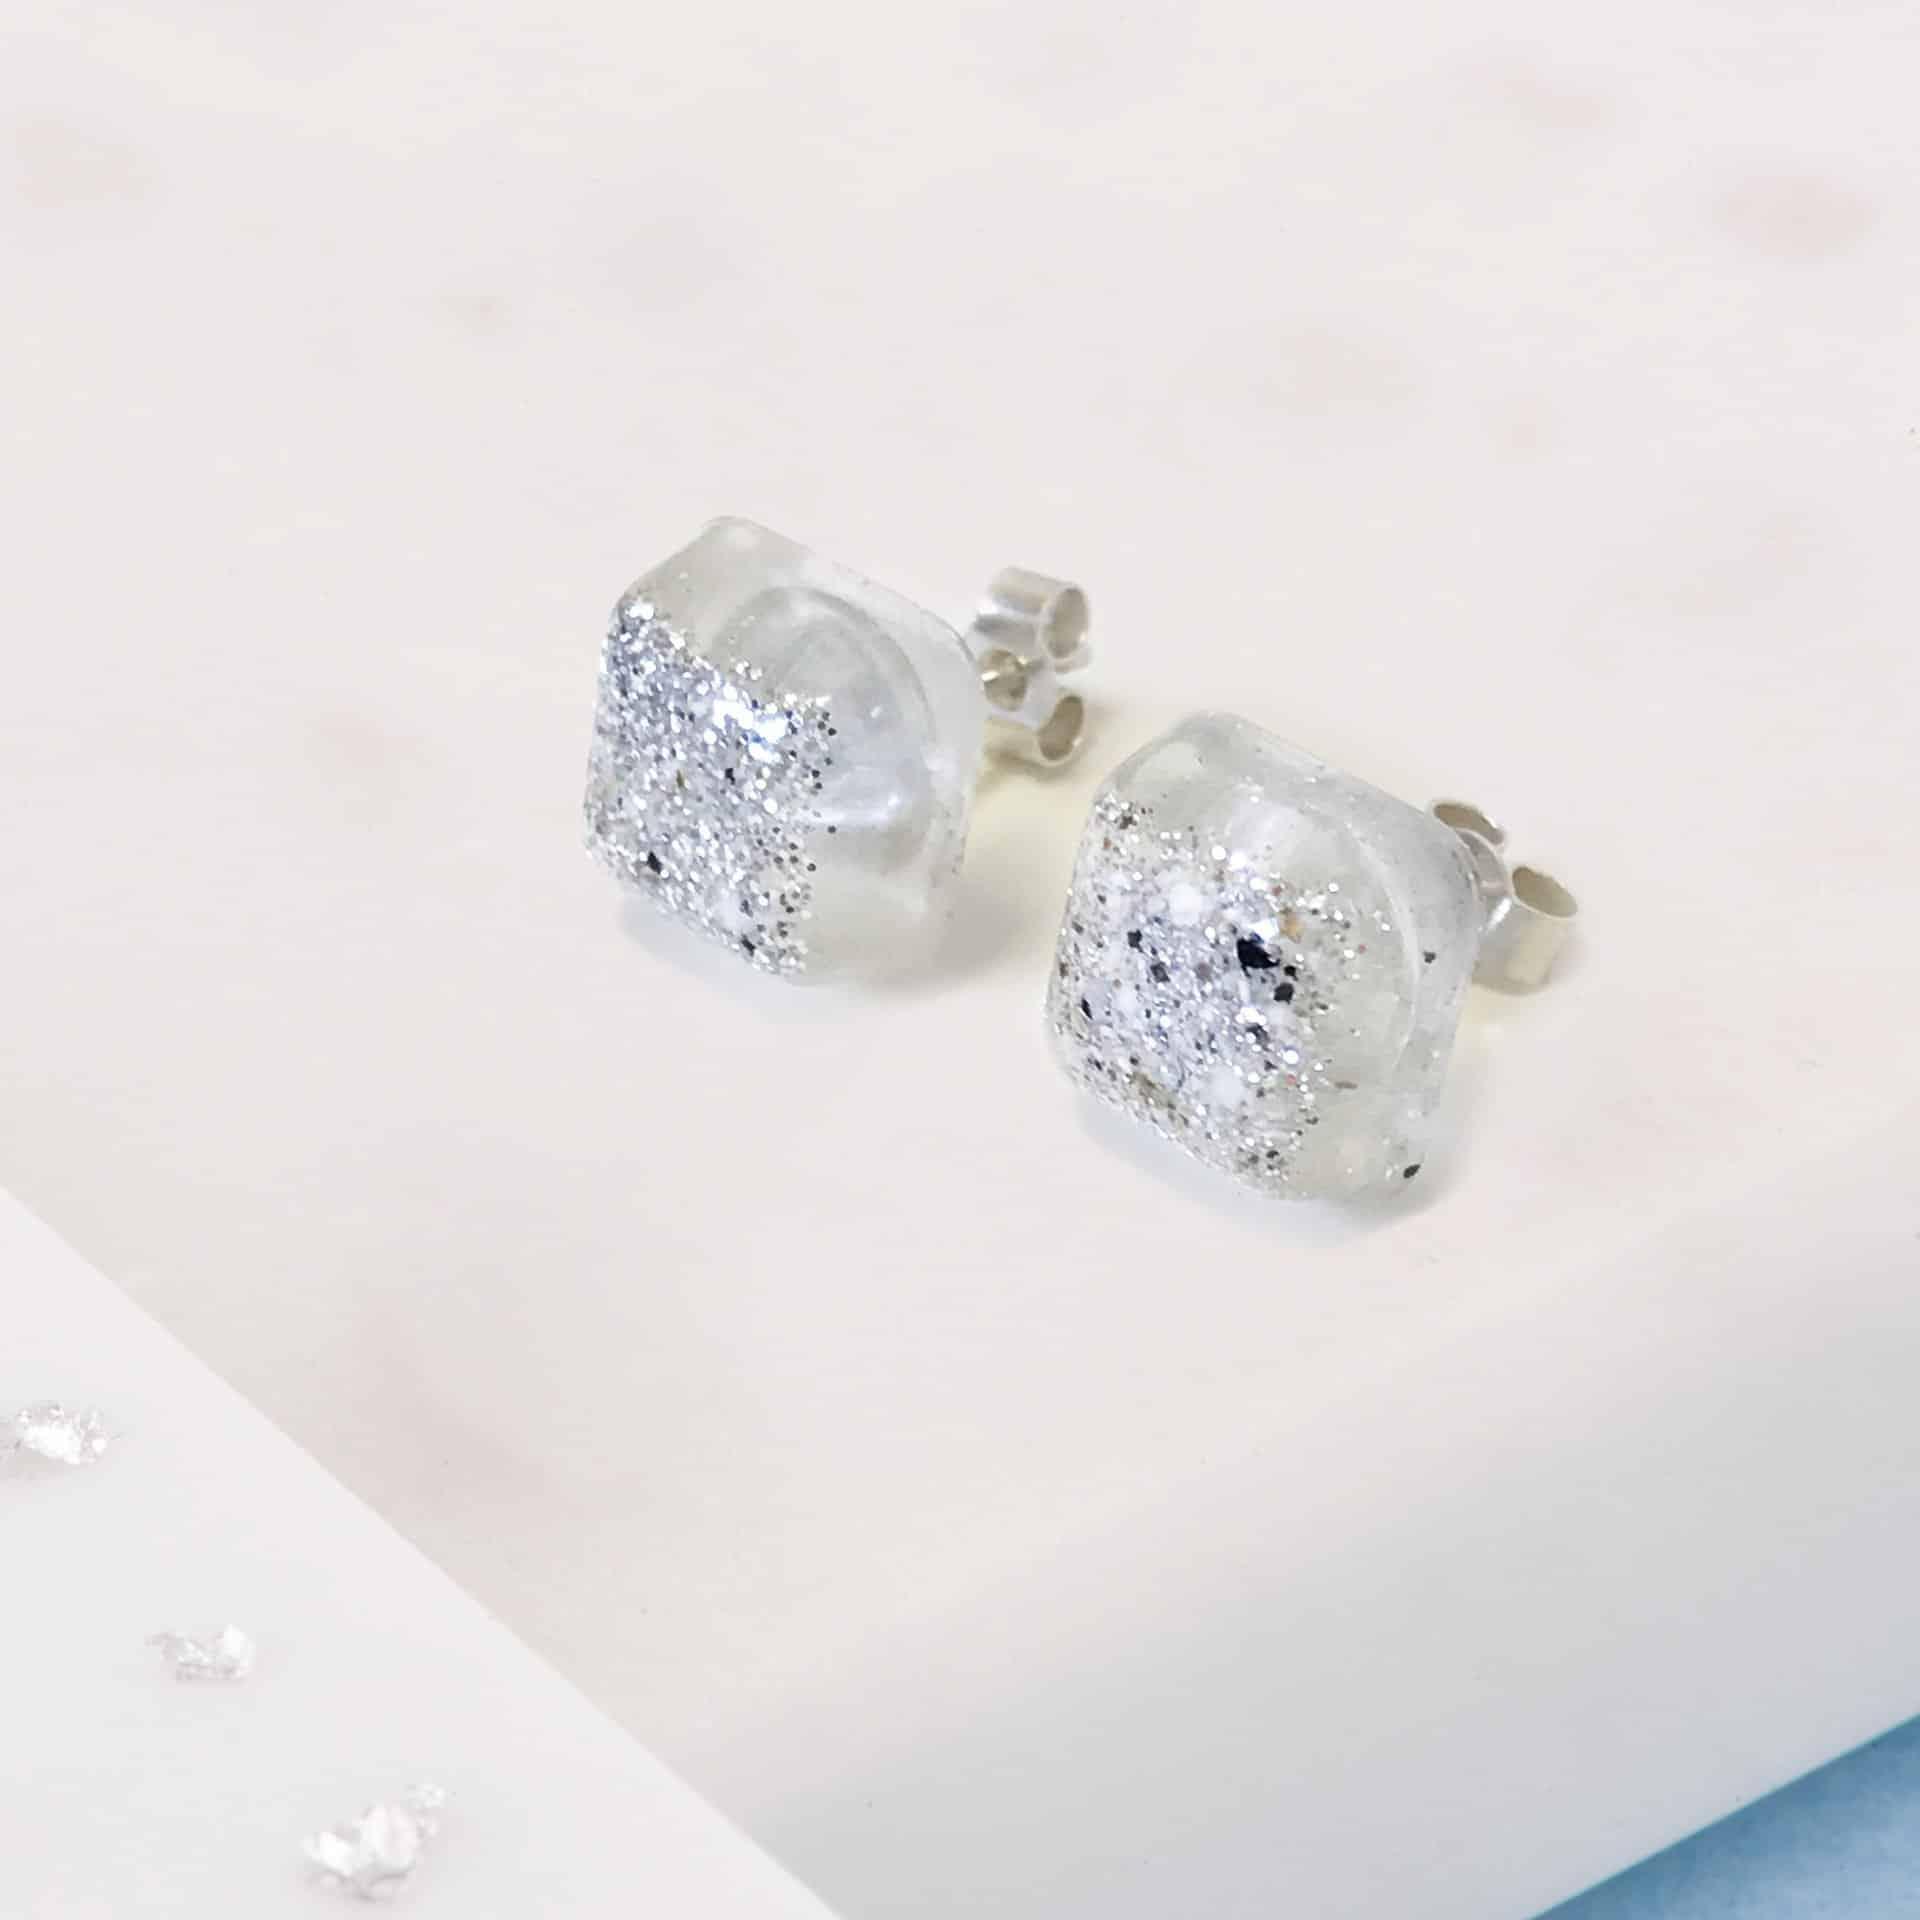 Resin Square Stud Earrings